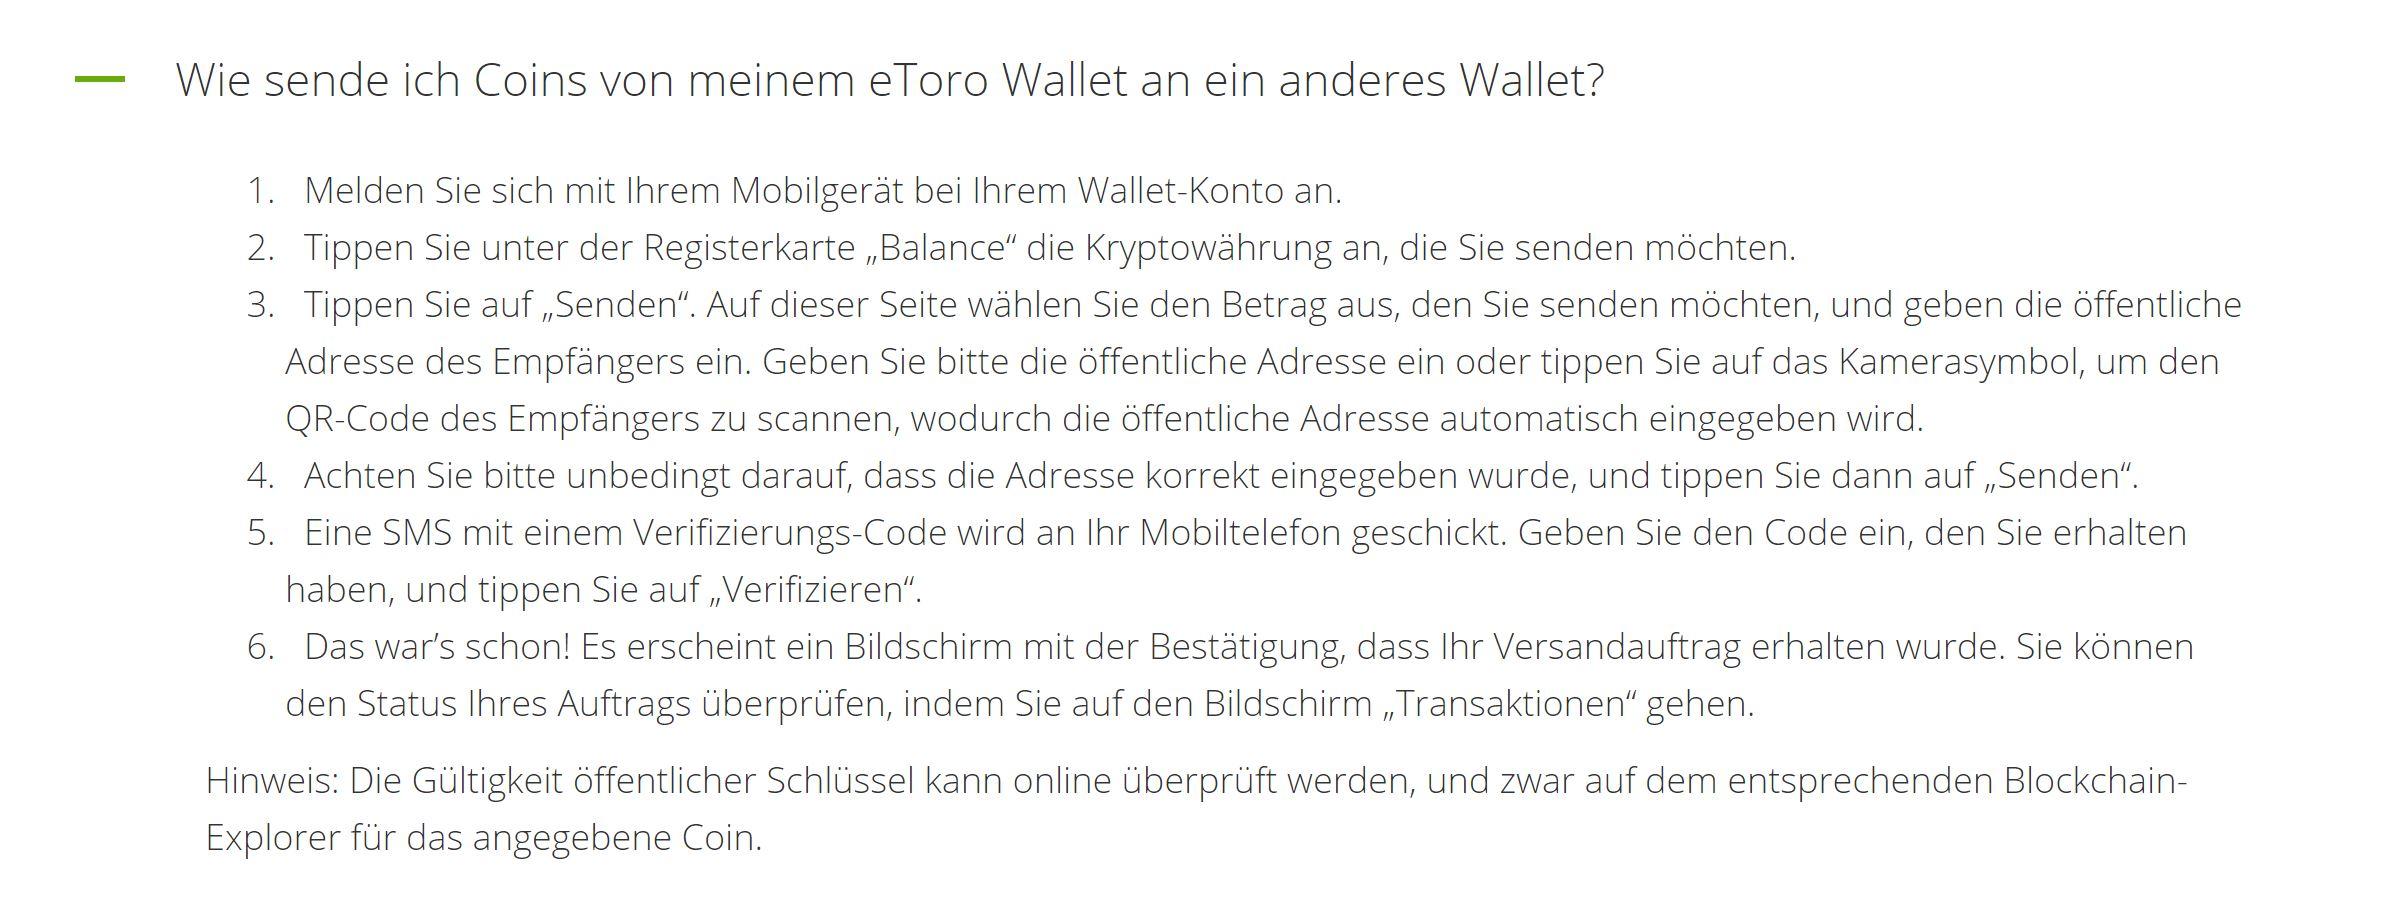 eToro Wallet Krypto senden